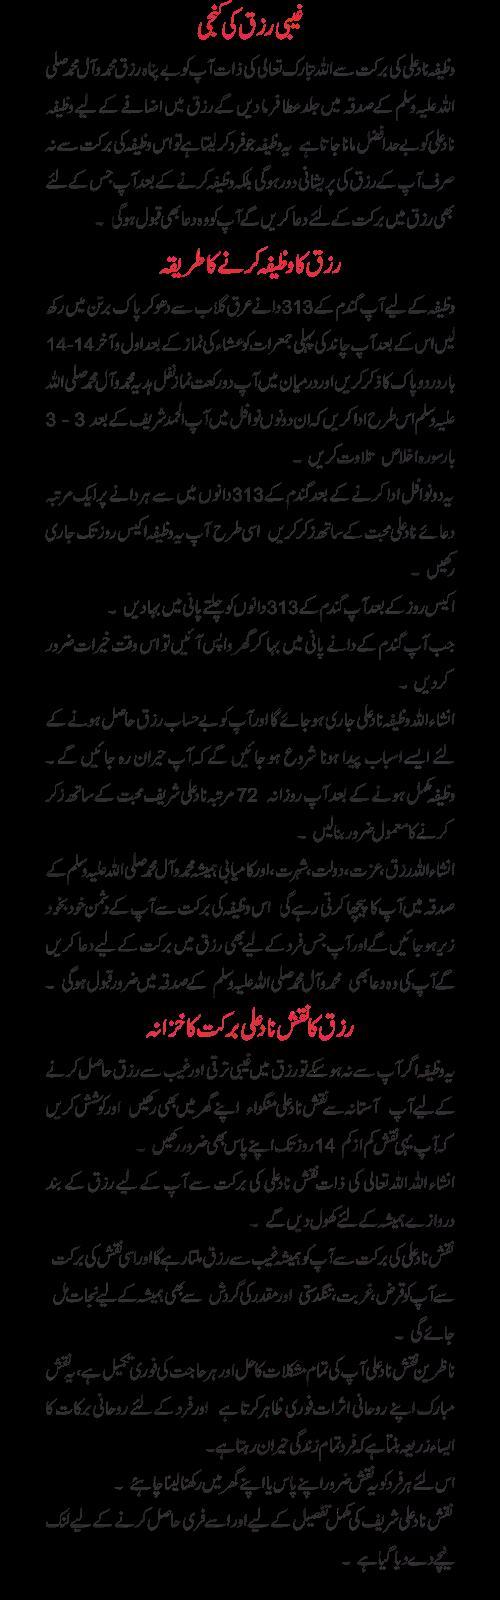 rizq-mein-barkat-ka-wazifa-nade-ali - https://www.nadeali.org/